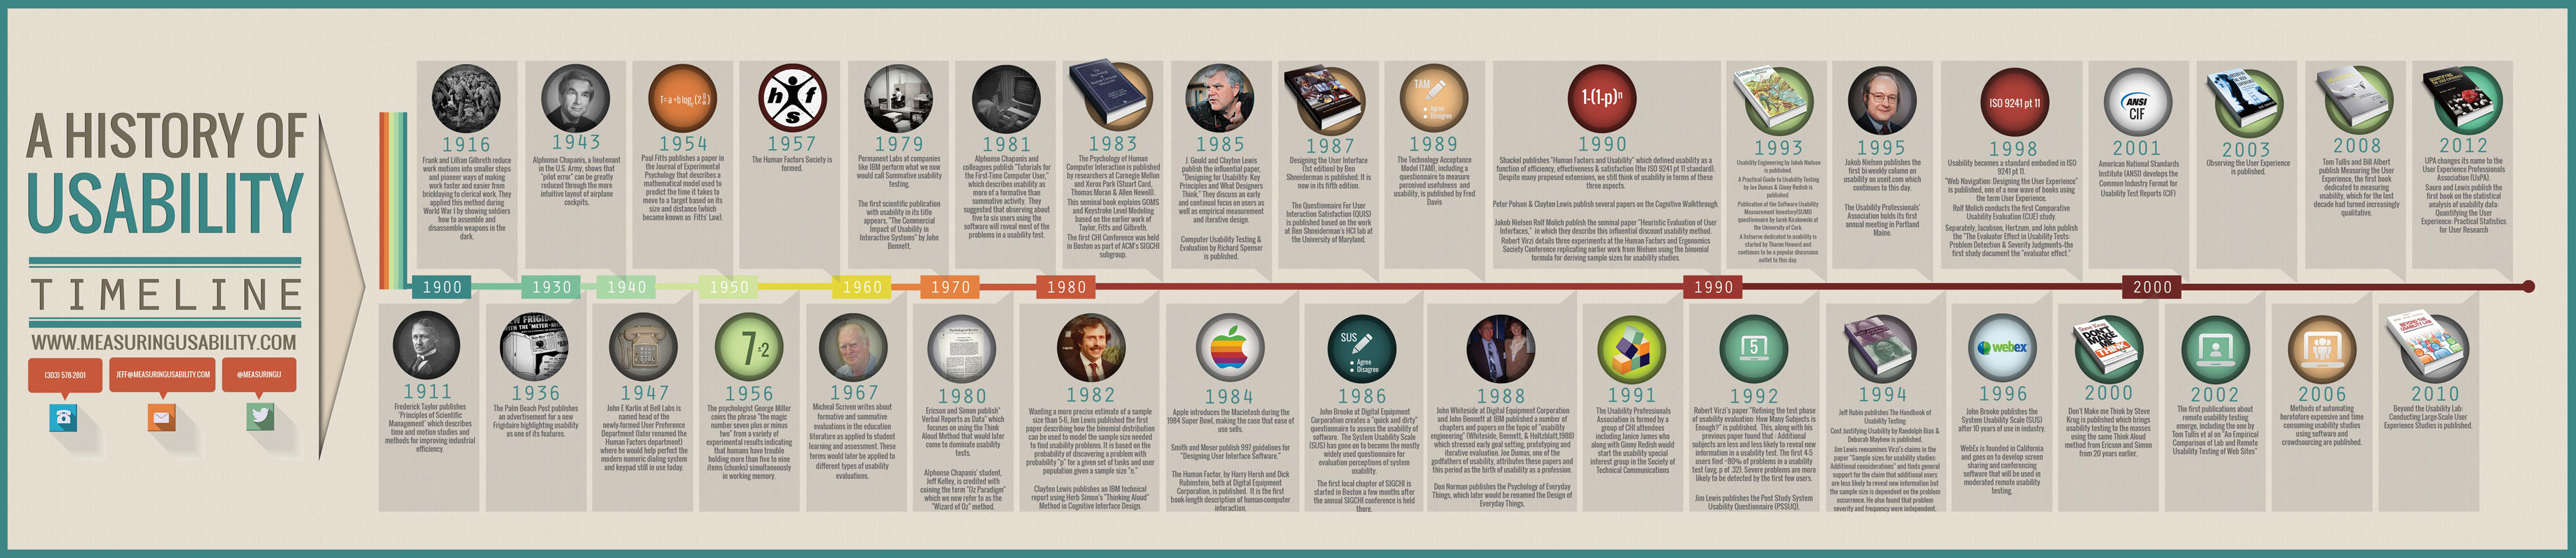 measuringu  usability timeline infographic